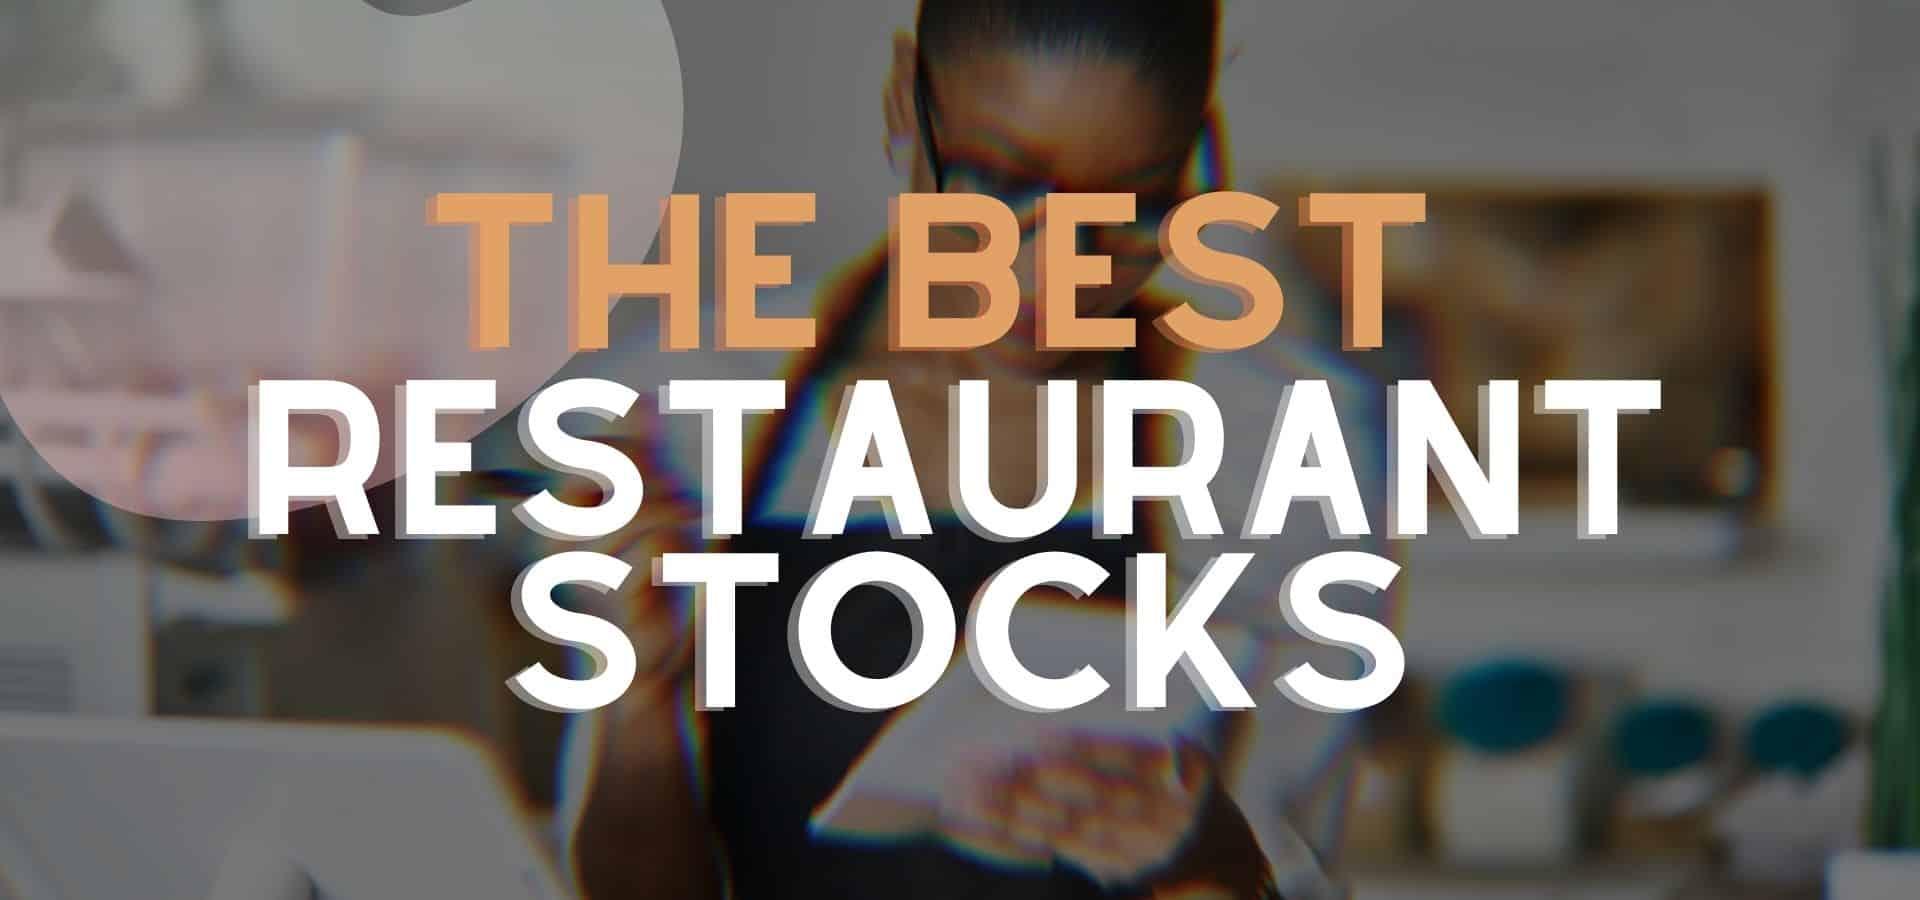 The 10 Best Restaurant Stocks To Watch In 2020